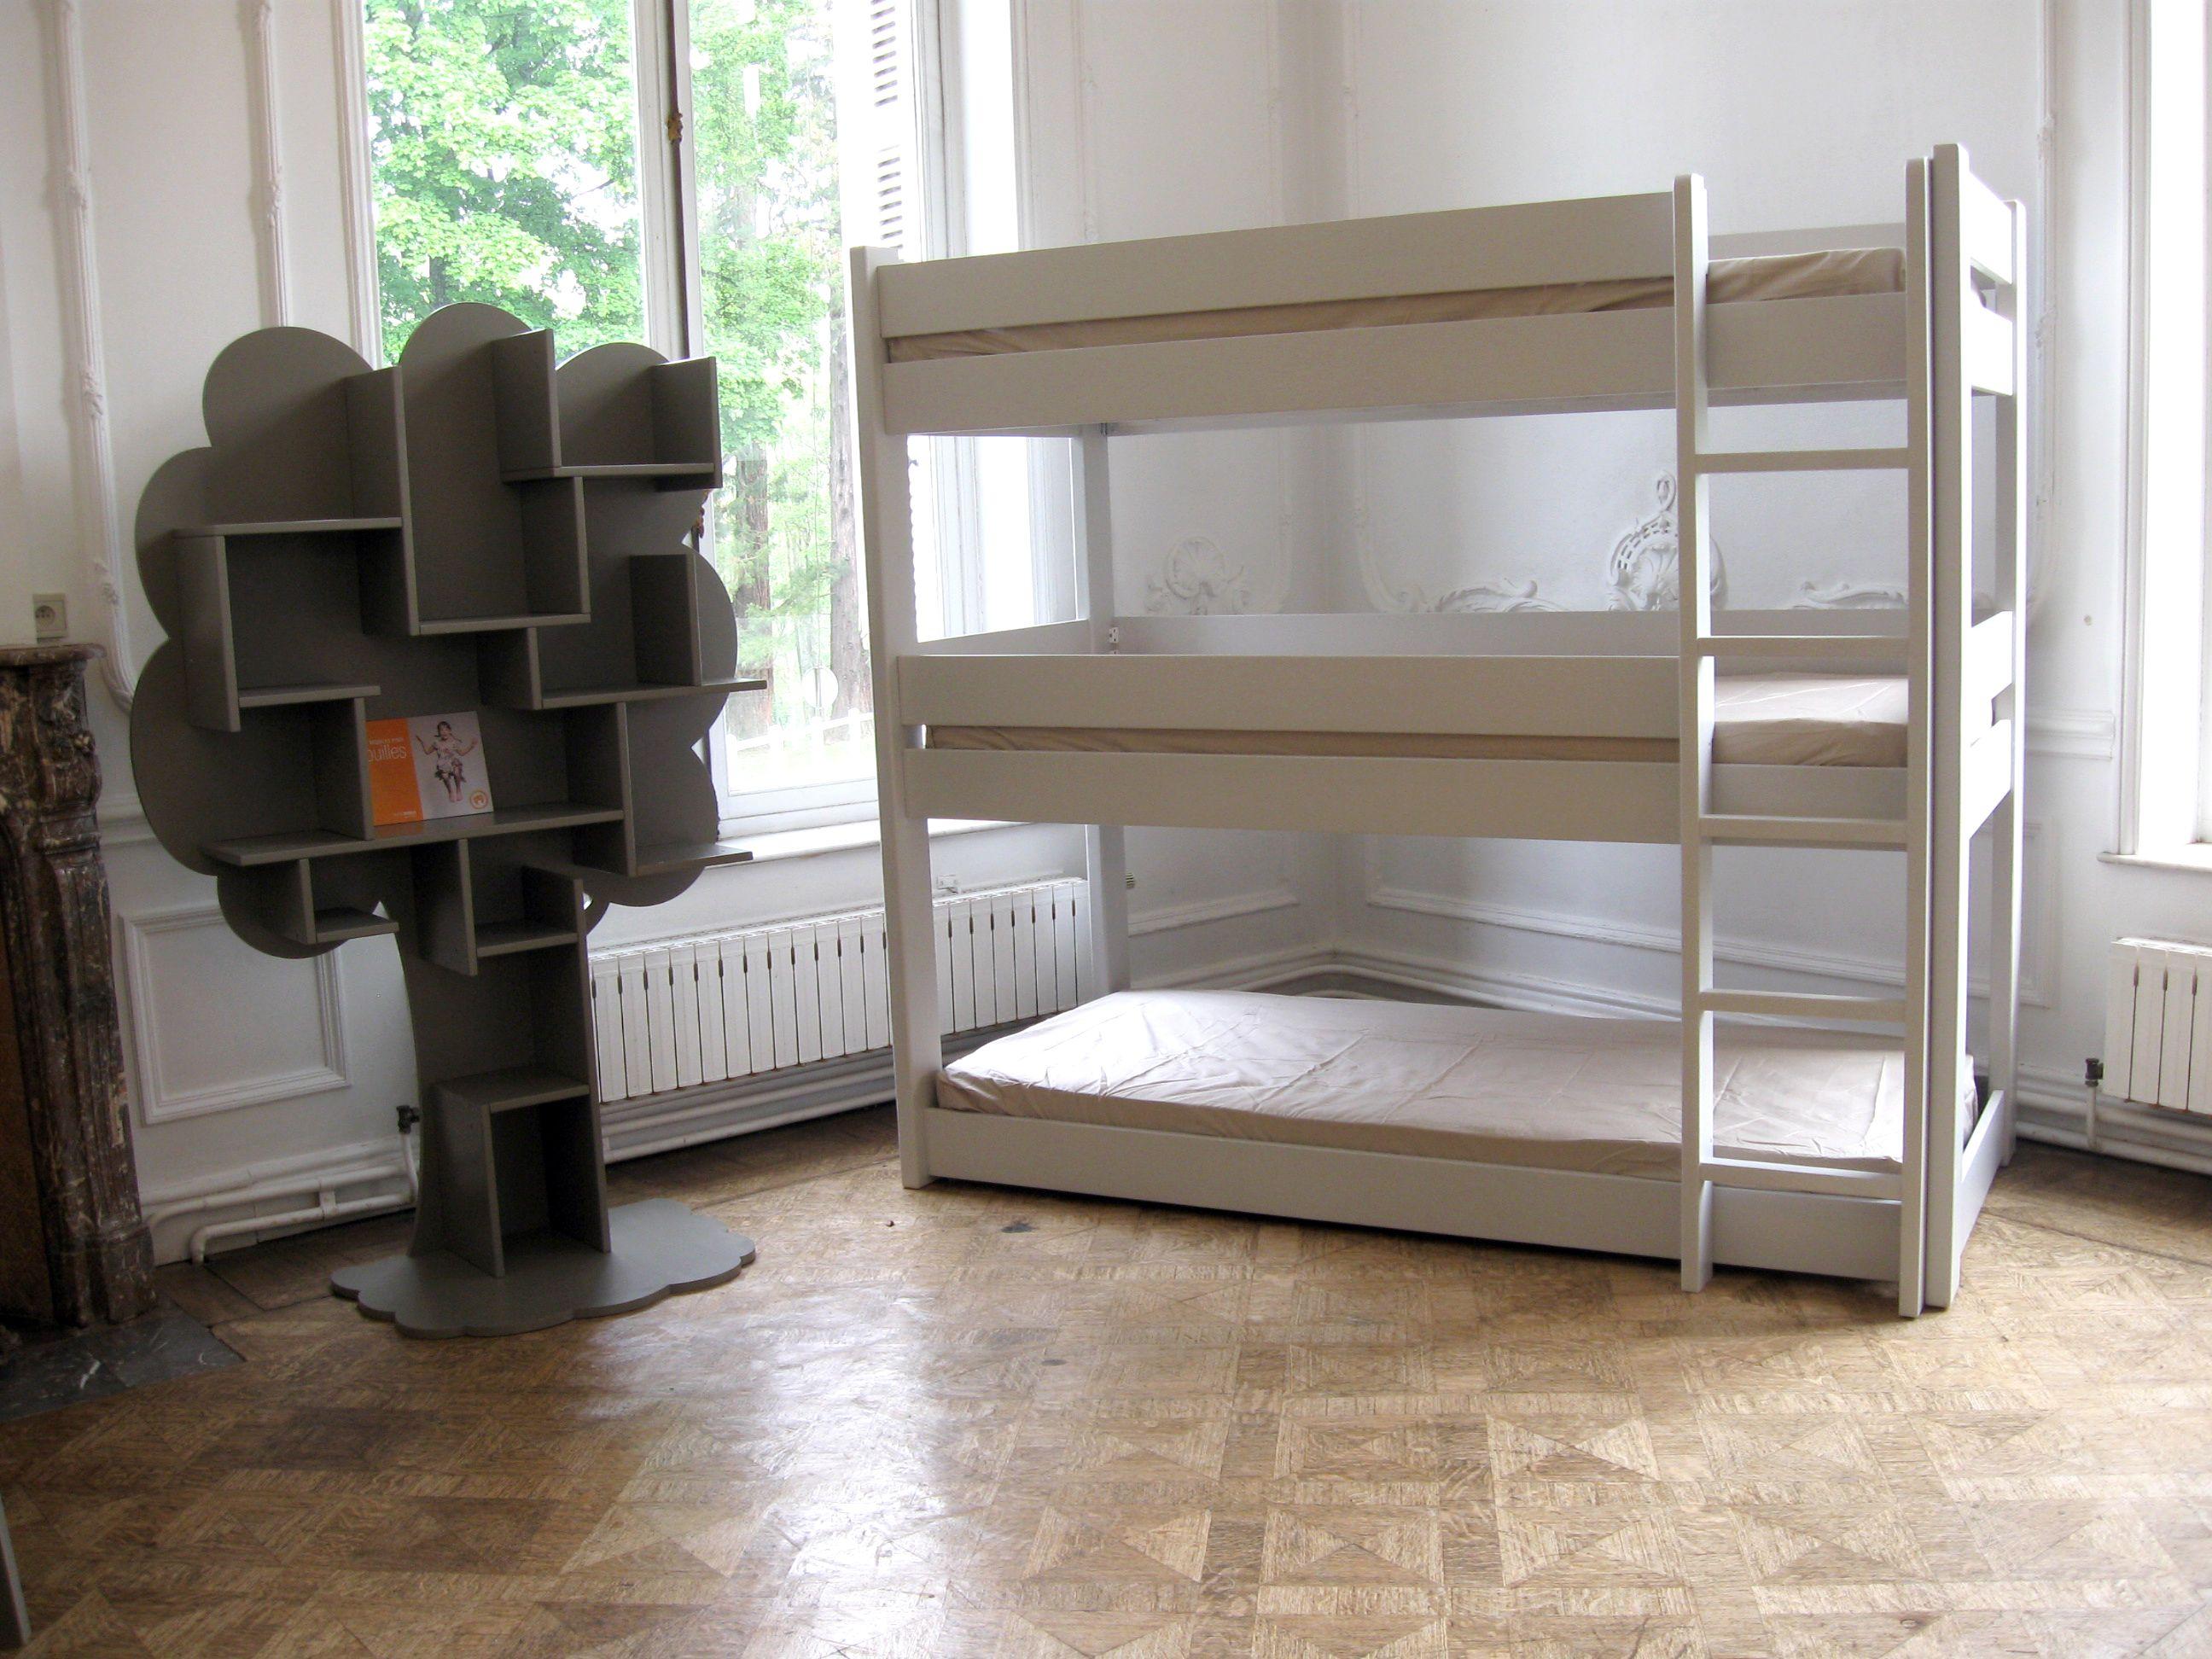 Dreier Etagenbett : Er etagenbett dominque h kinderzimmer